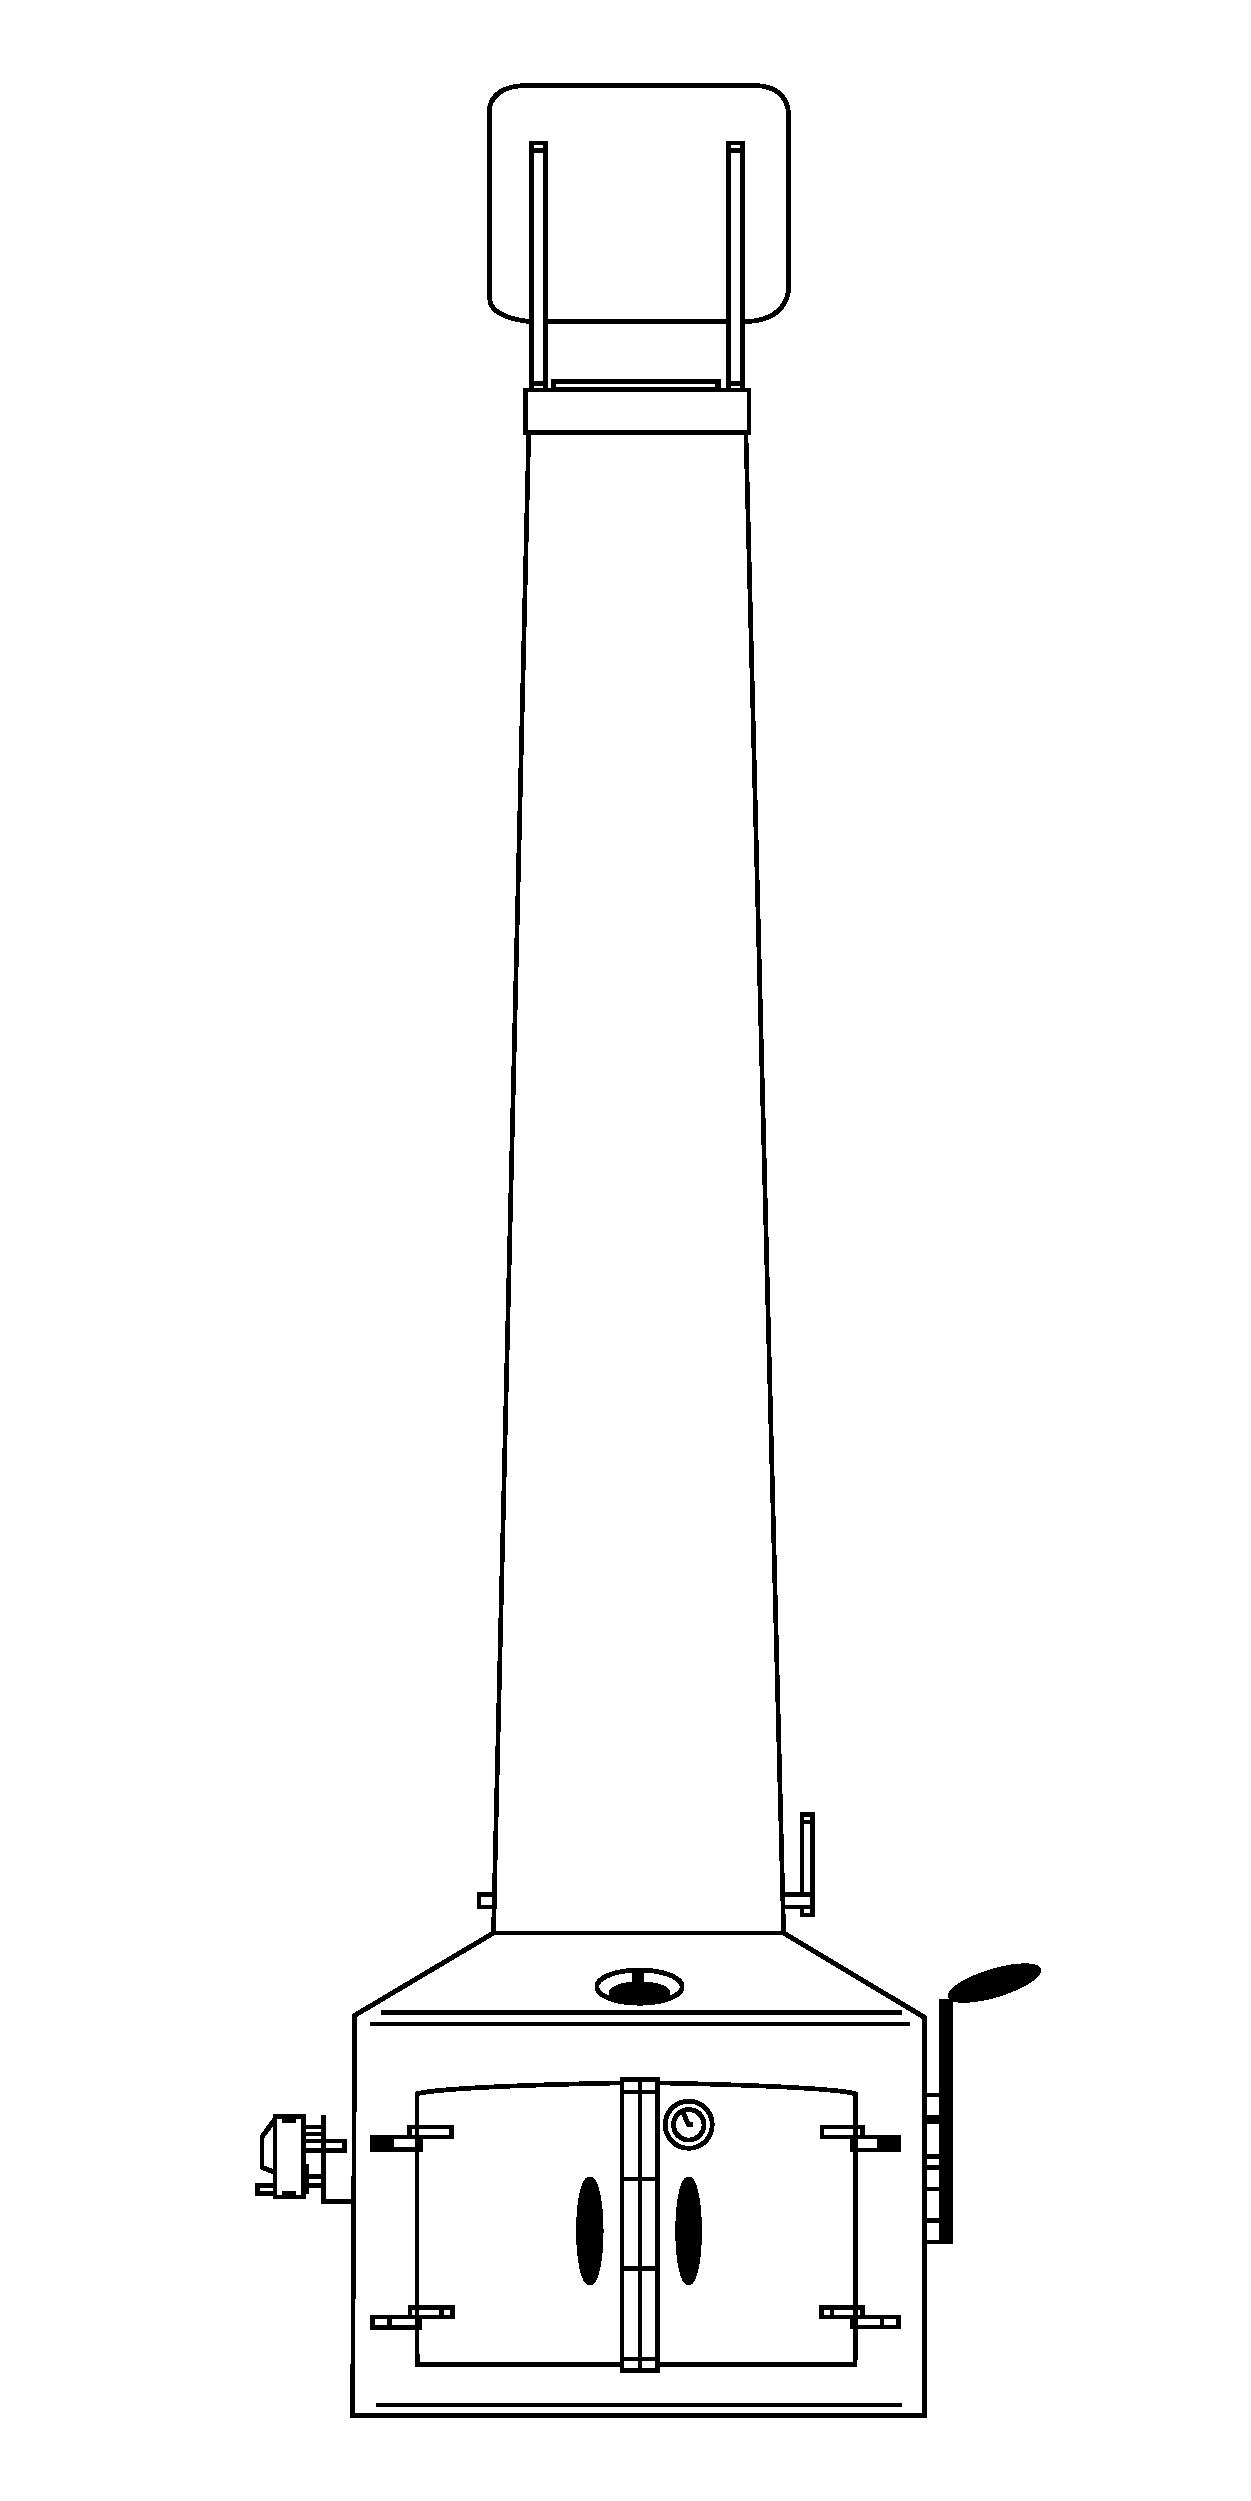 EngelFires_linediagram-02.png